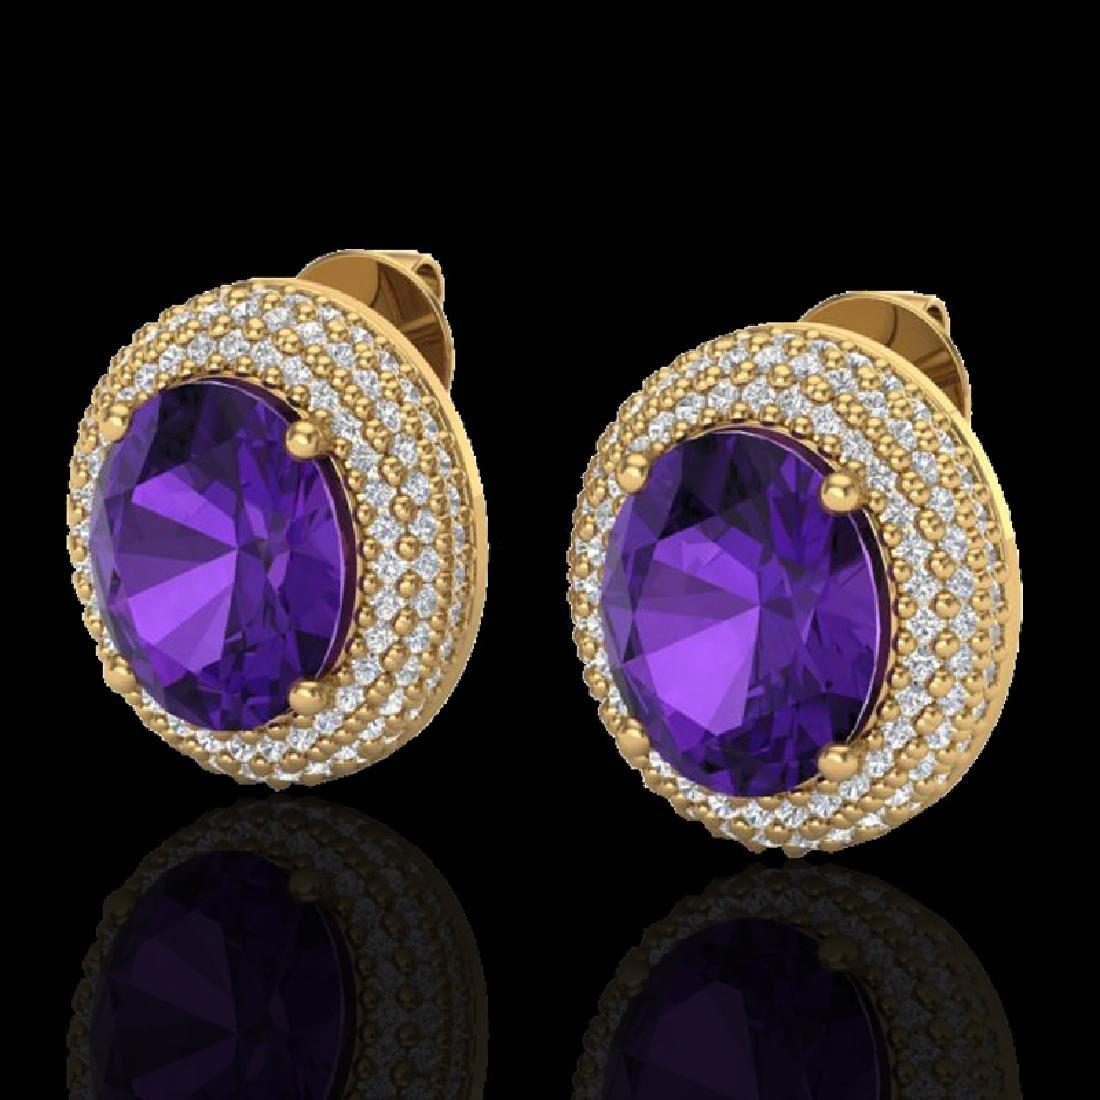 8 CTW Amethyst & Micro Pave VS/SI Diamond Earrings 18K